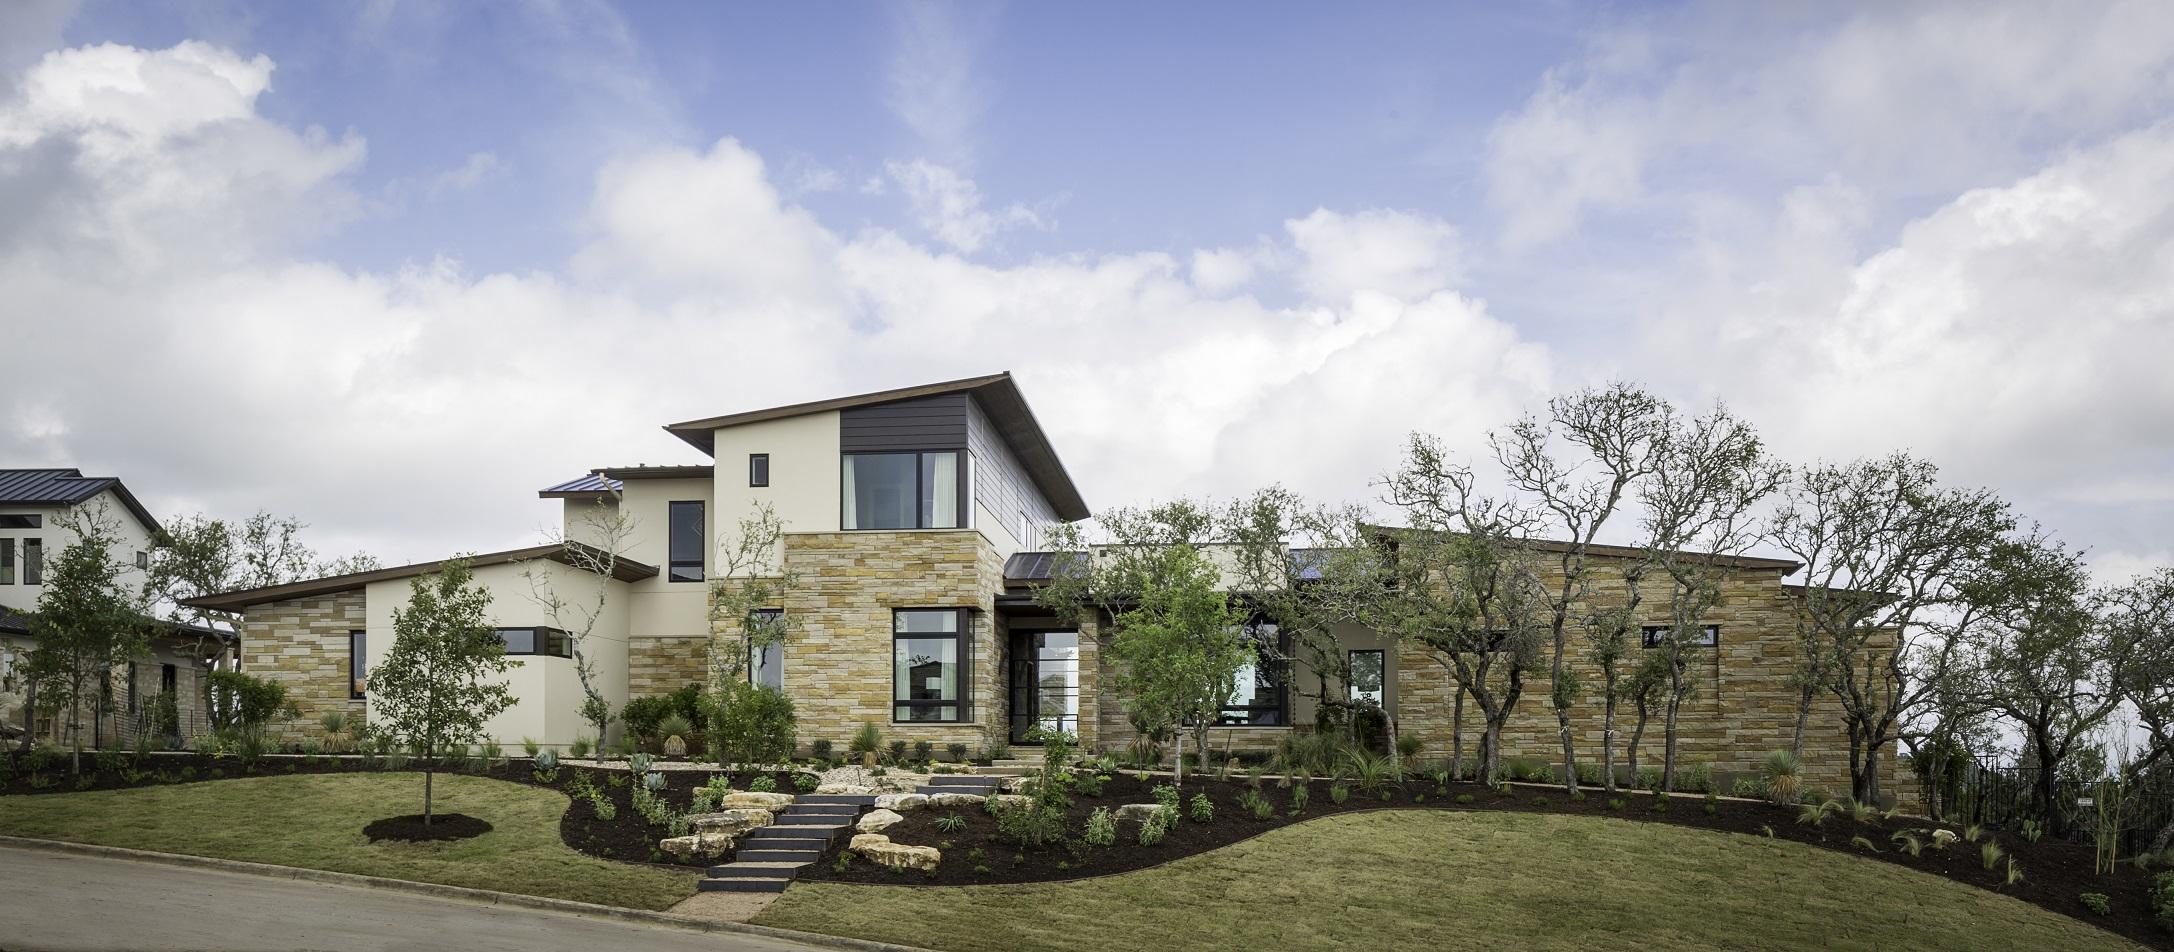 Duckhorn Residence - exterior shot